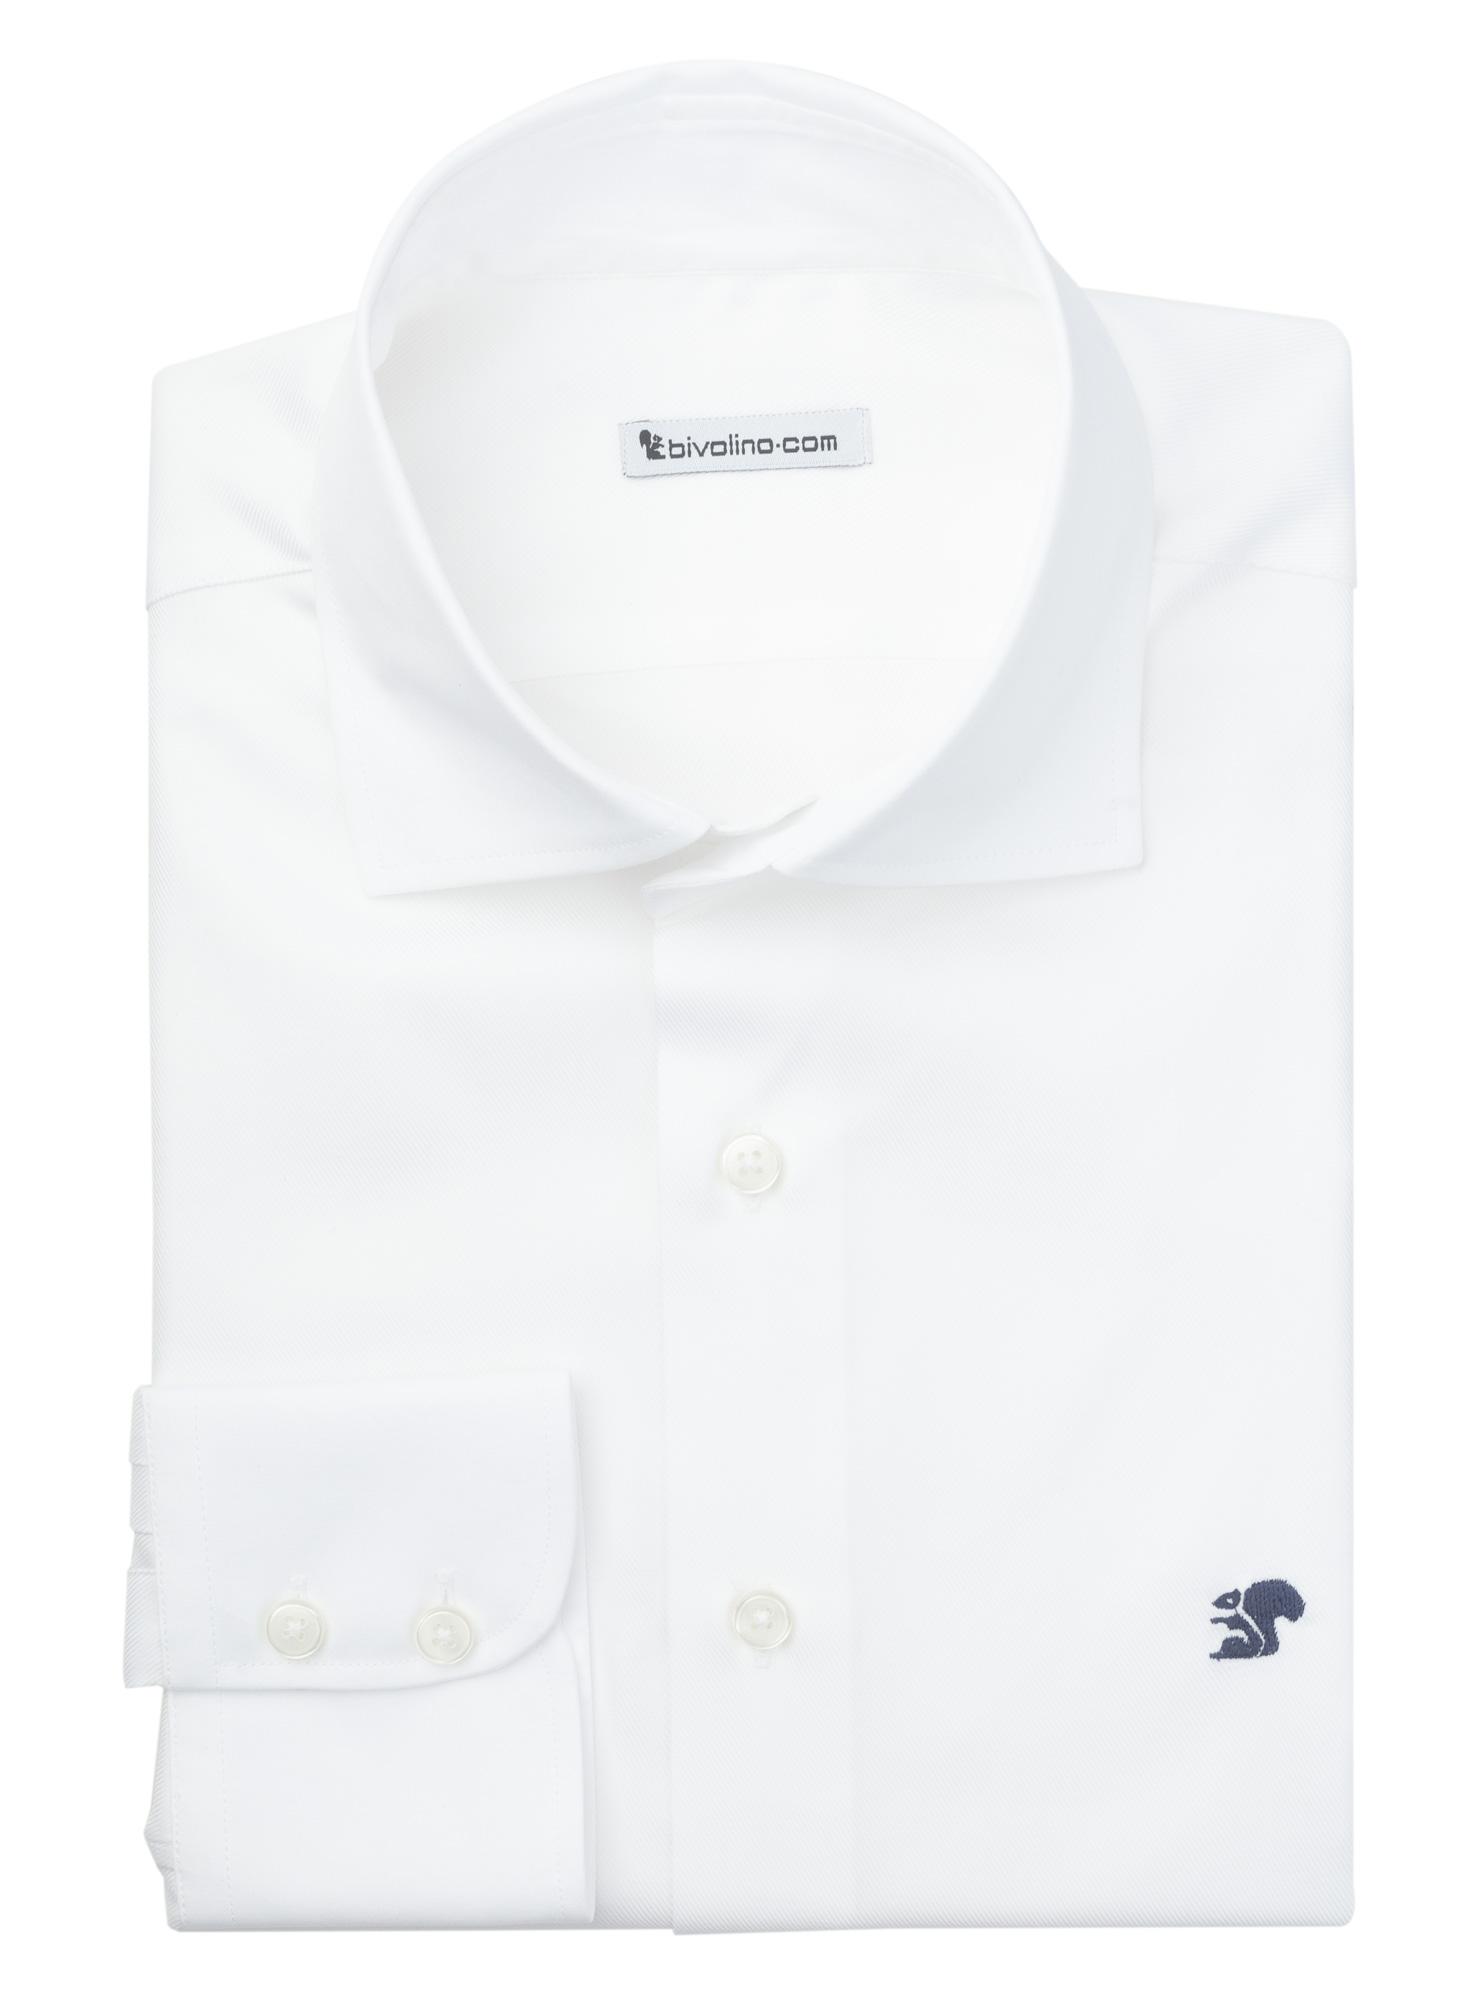 FABRO - chemise homme DAVID and JOHN ANDERSON d' ALBINI  twill double retors blanc - ZAMBO 1